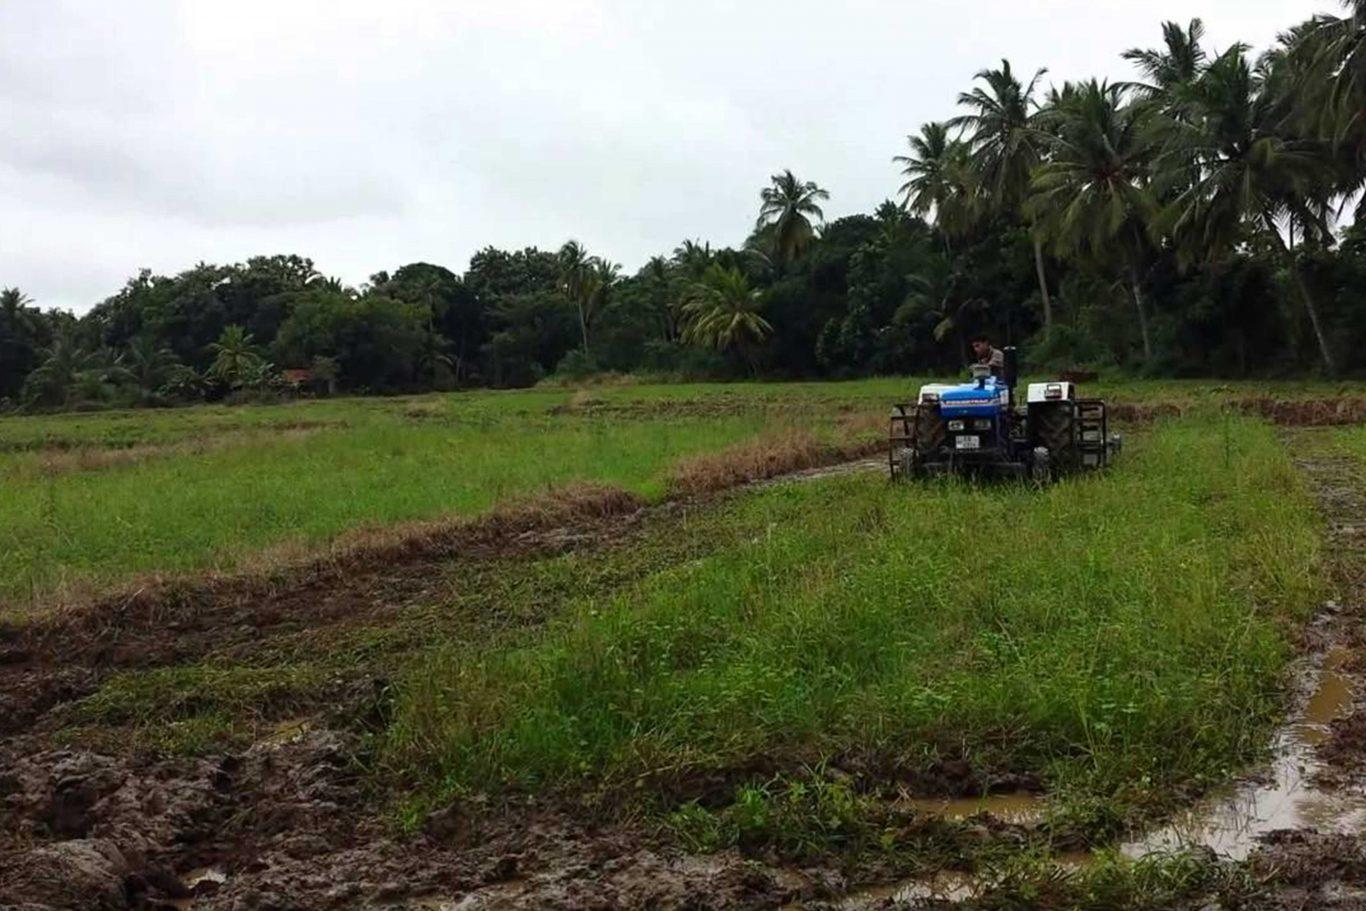 Araliya Rice | Paddy Cultivation in Sri Lanka